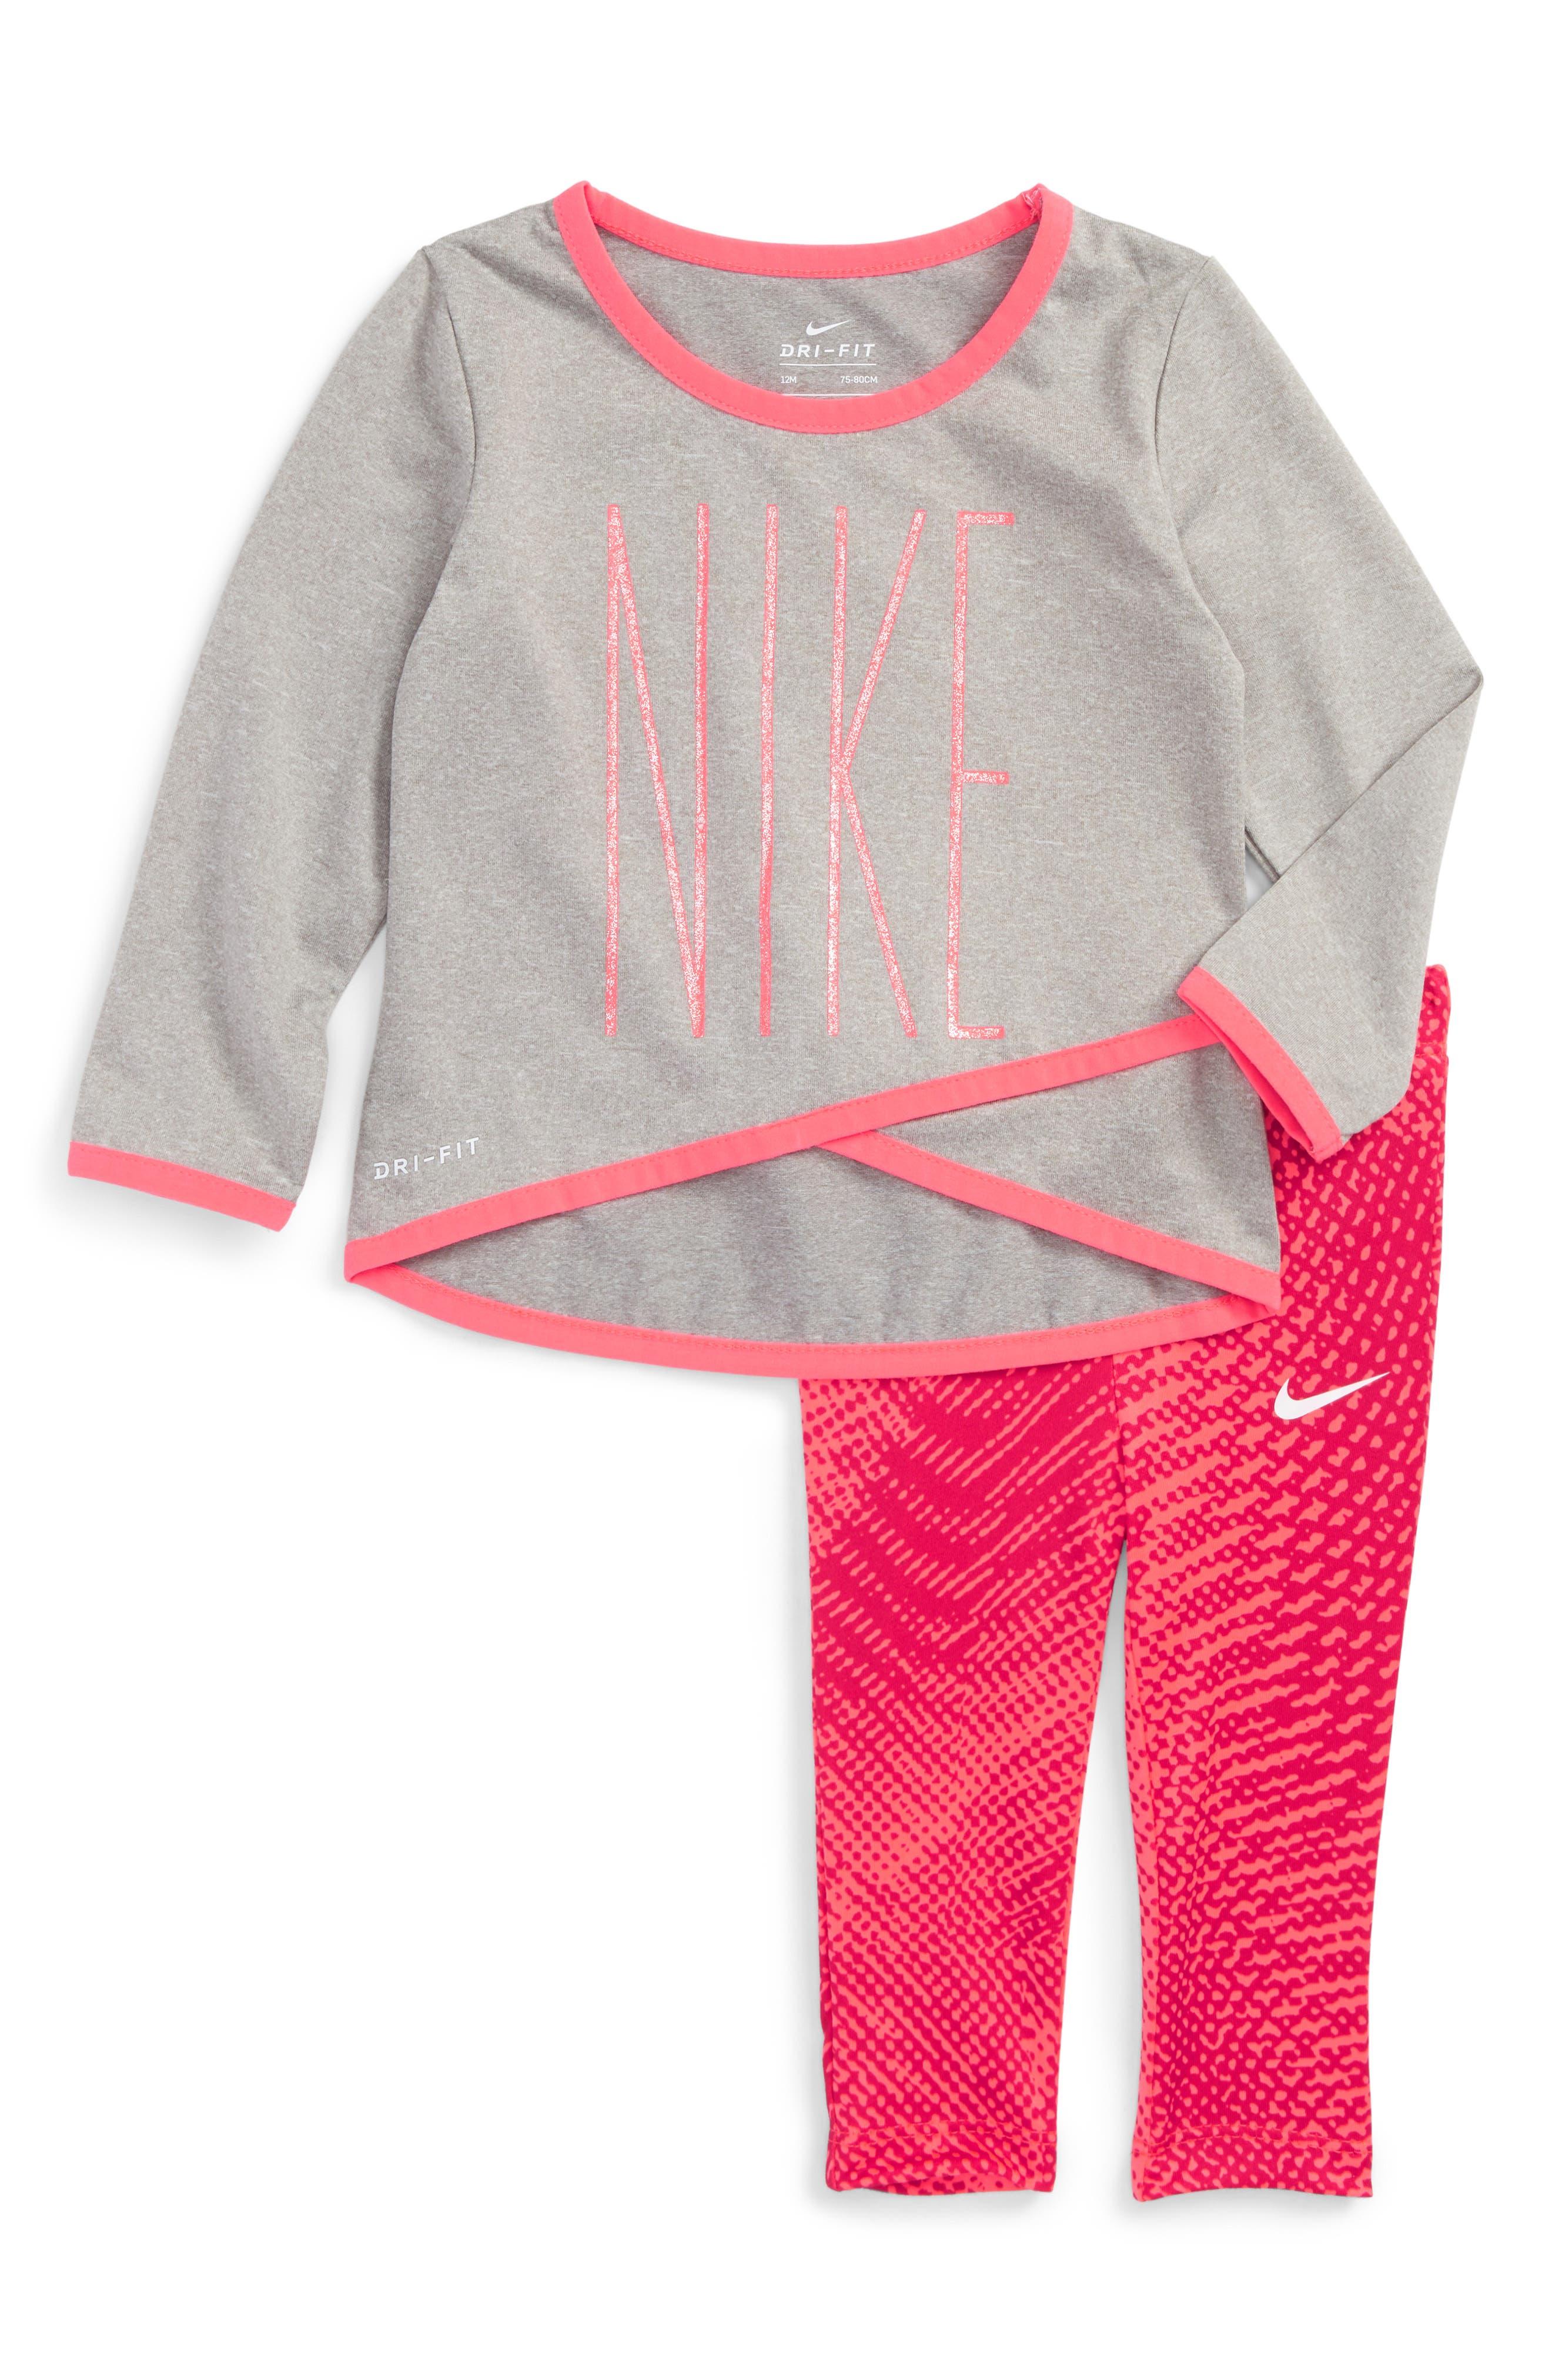 Main Image - NIke Dri-FIT Graphic Tee & Print Leggings Set (Baby Girls)